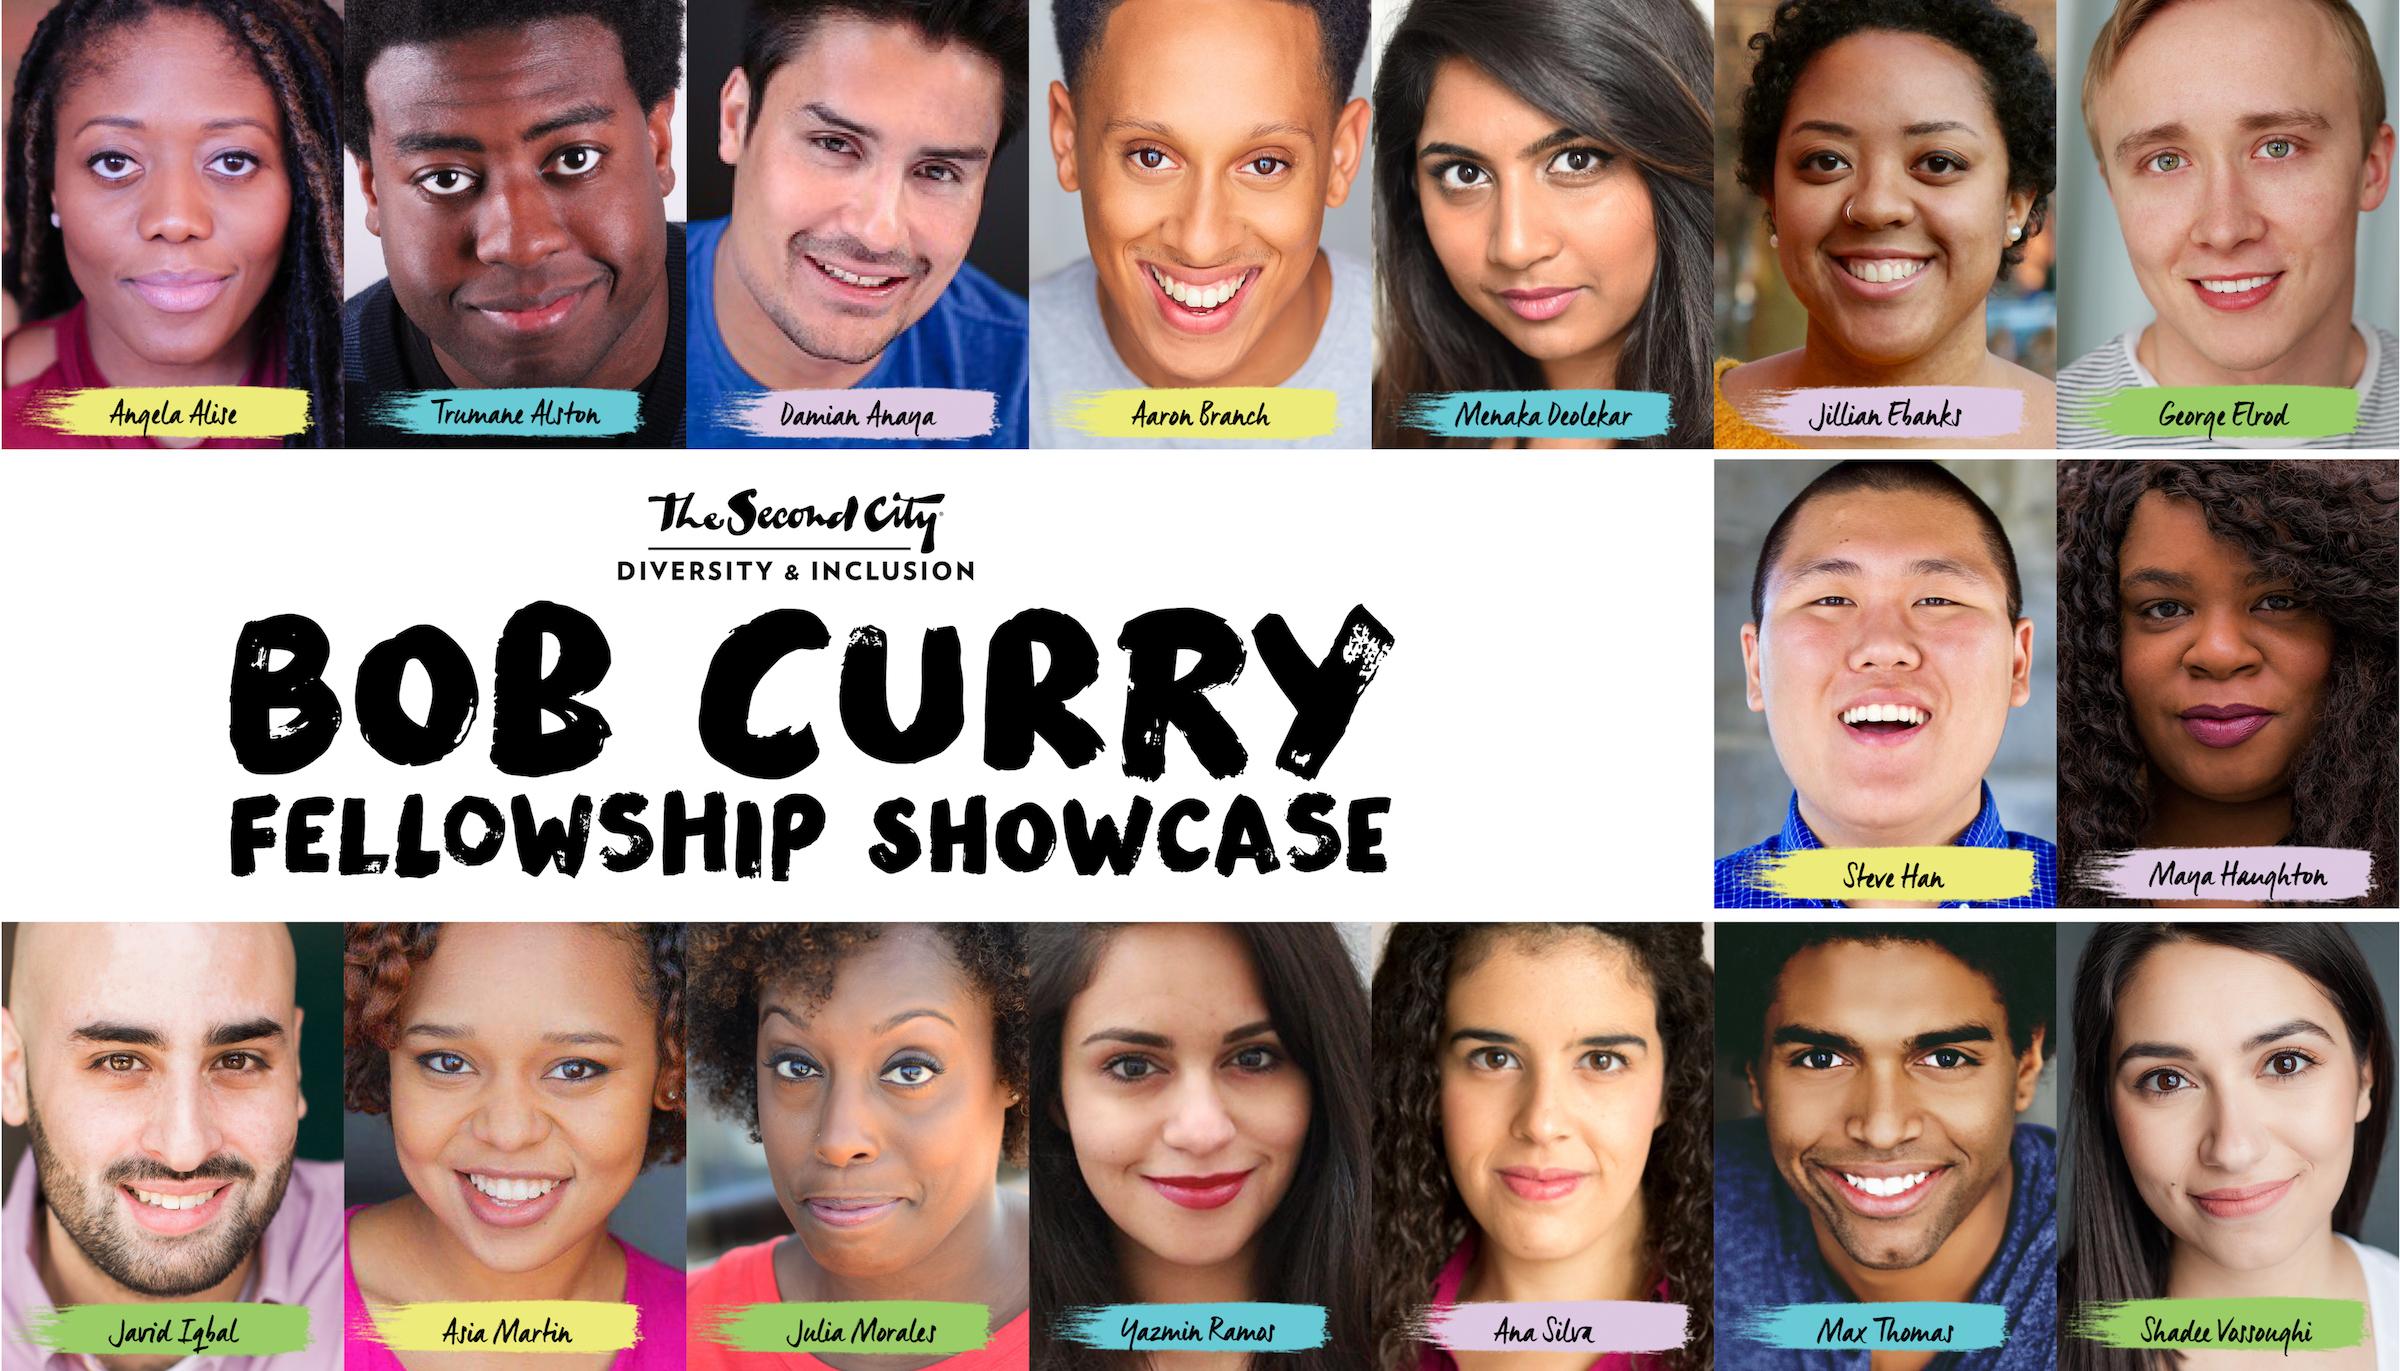 Bob Curry Showcase